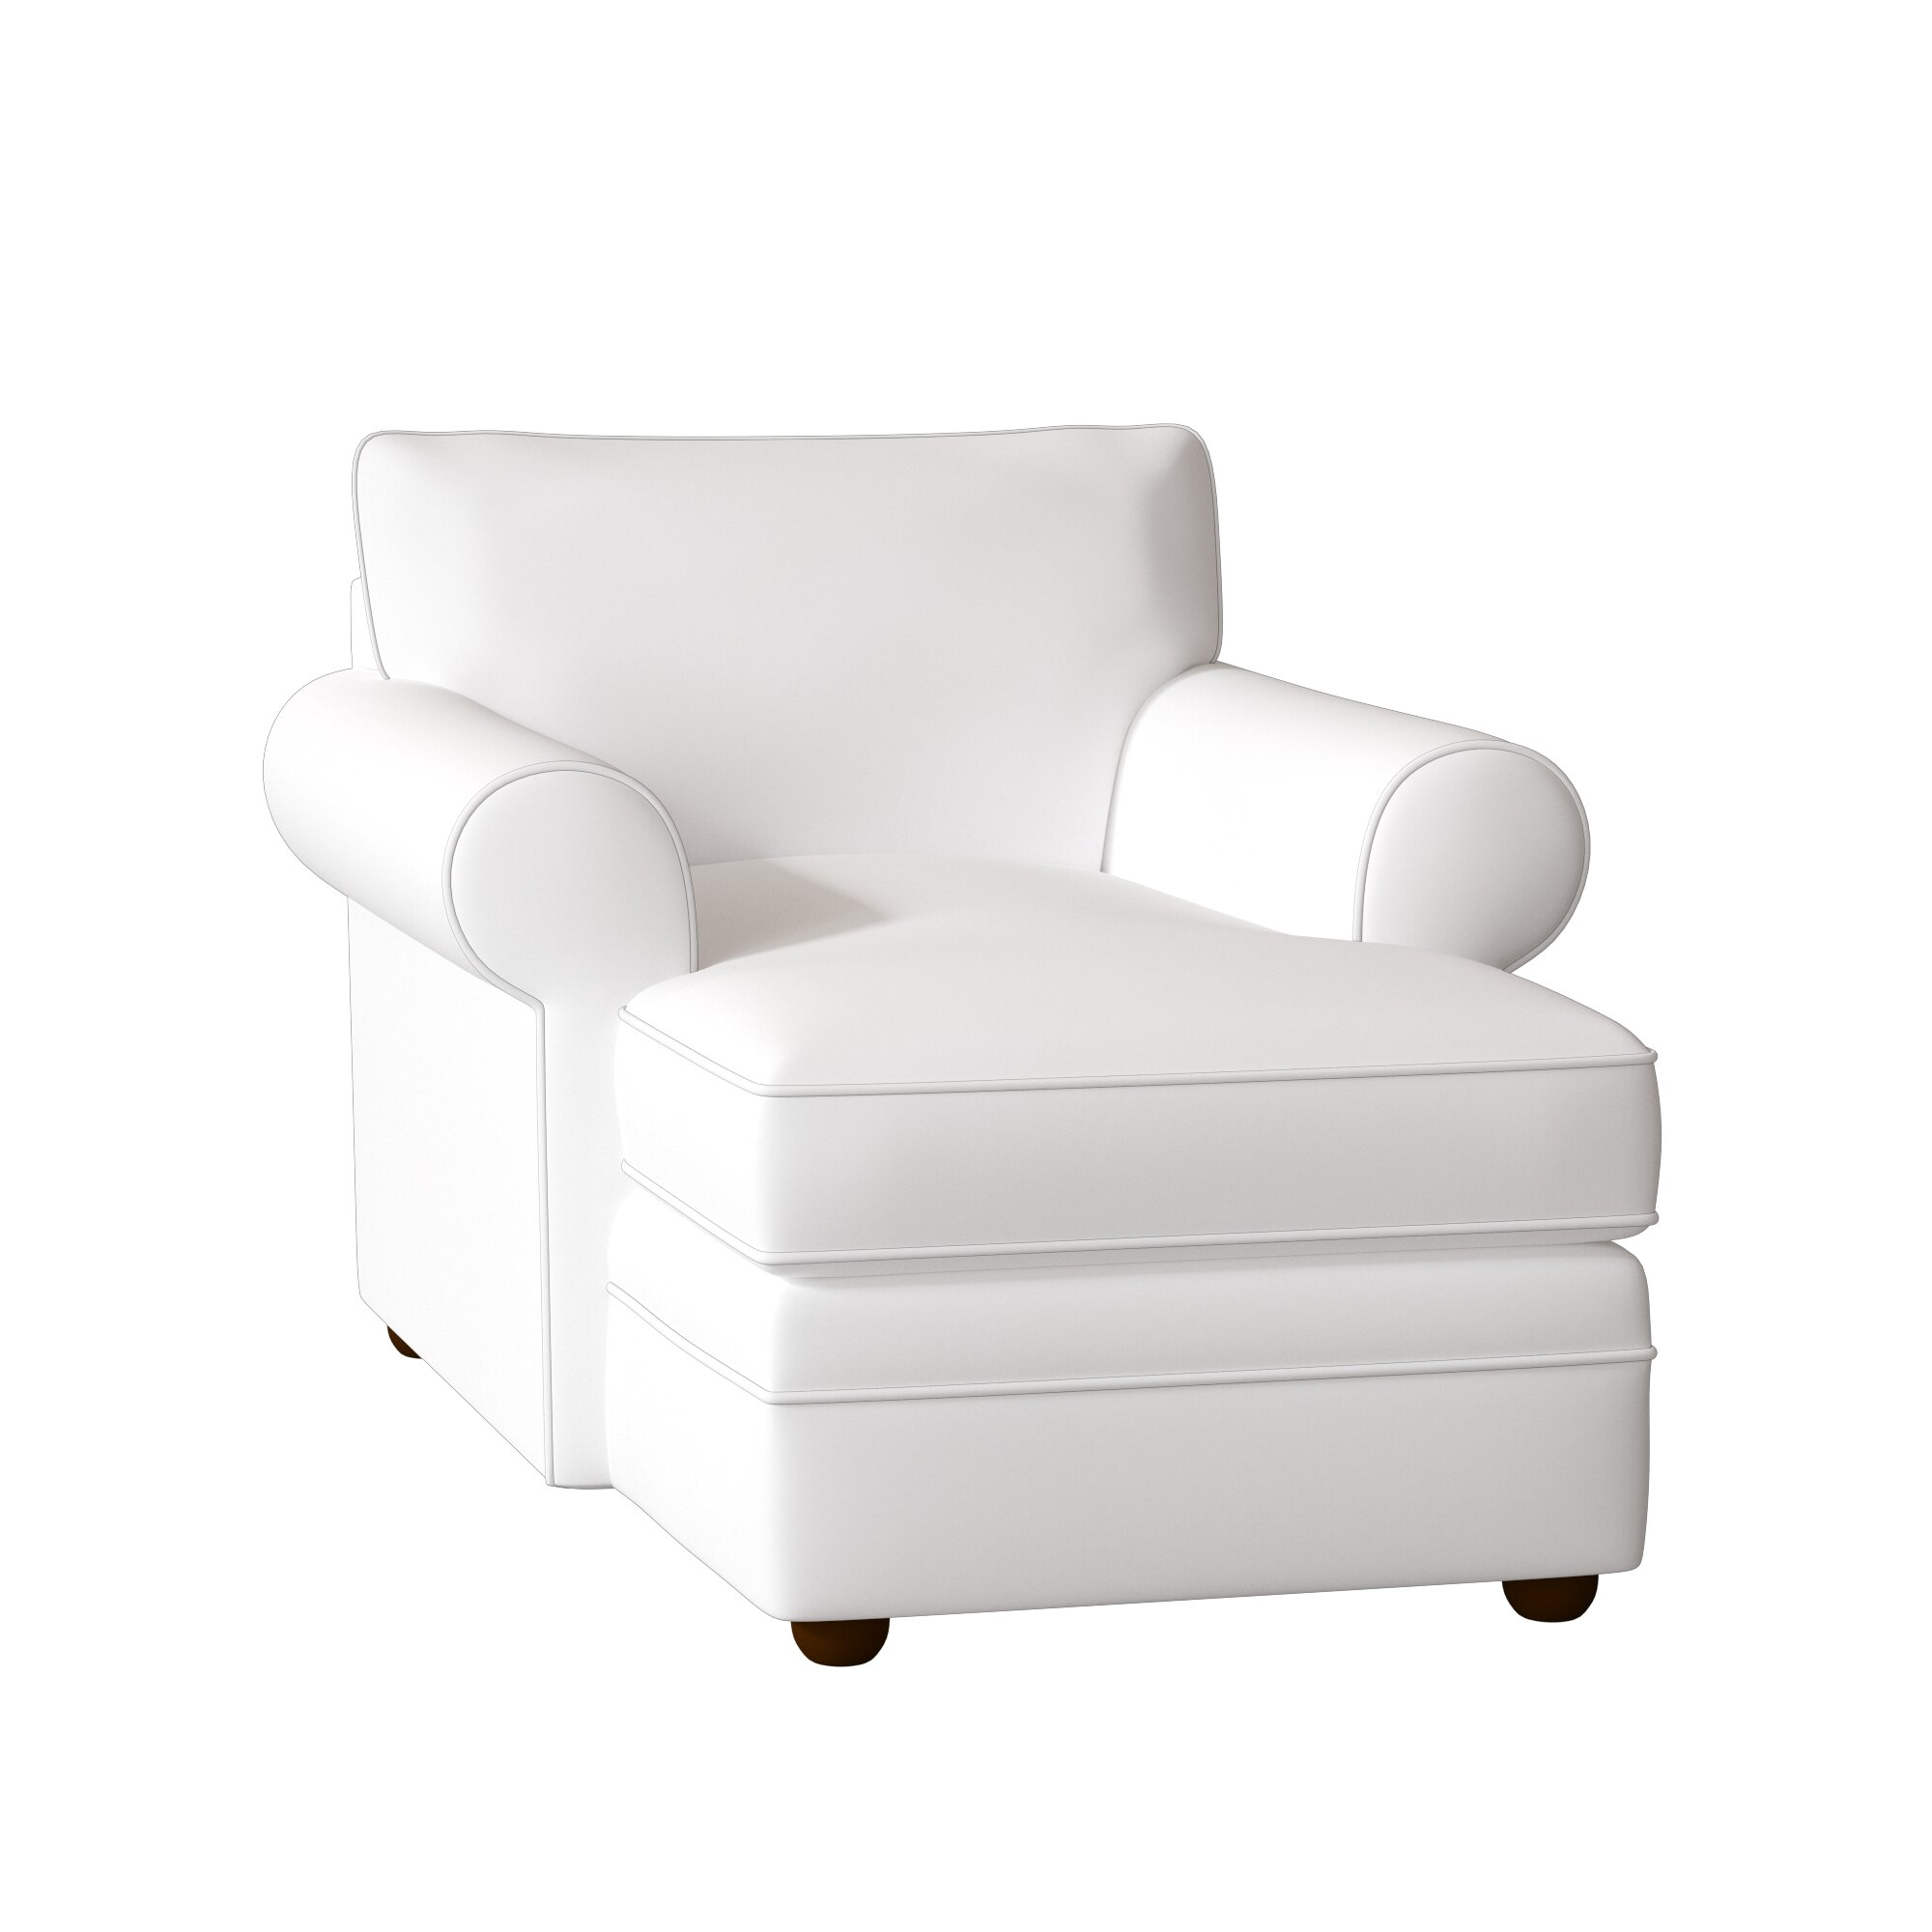 Awesome Newton Chaise Lounge Machost Co Dining Chair Design Ideas Machostcouk